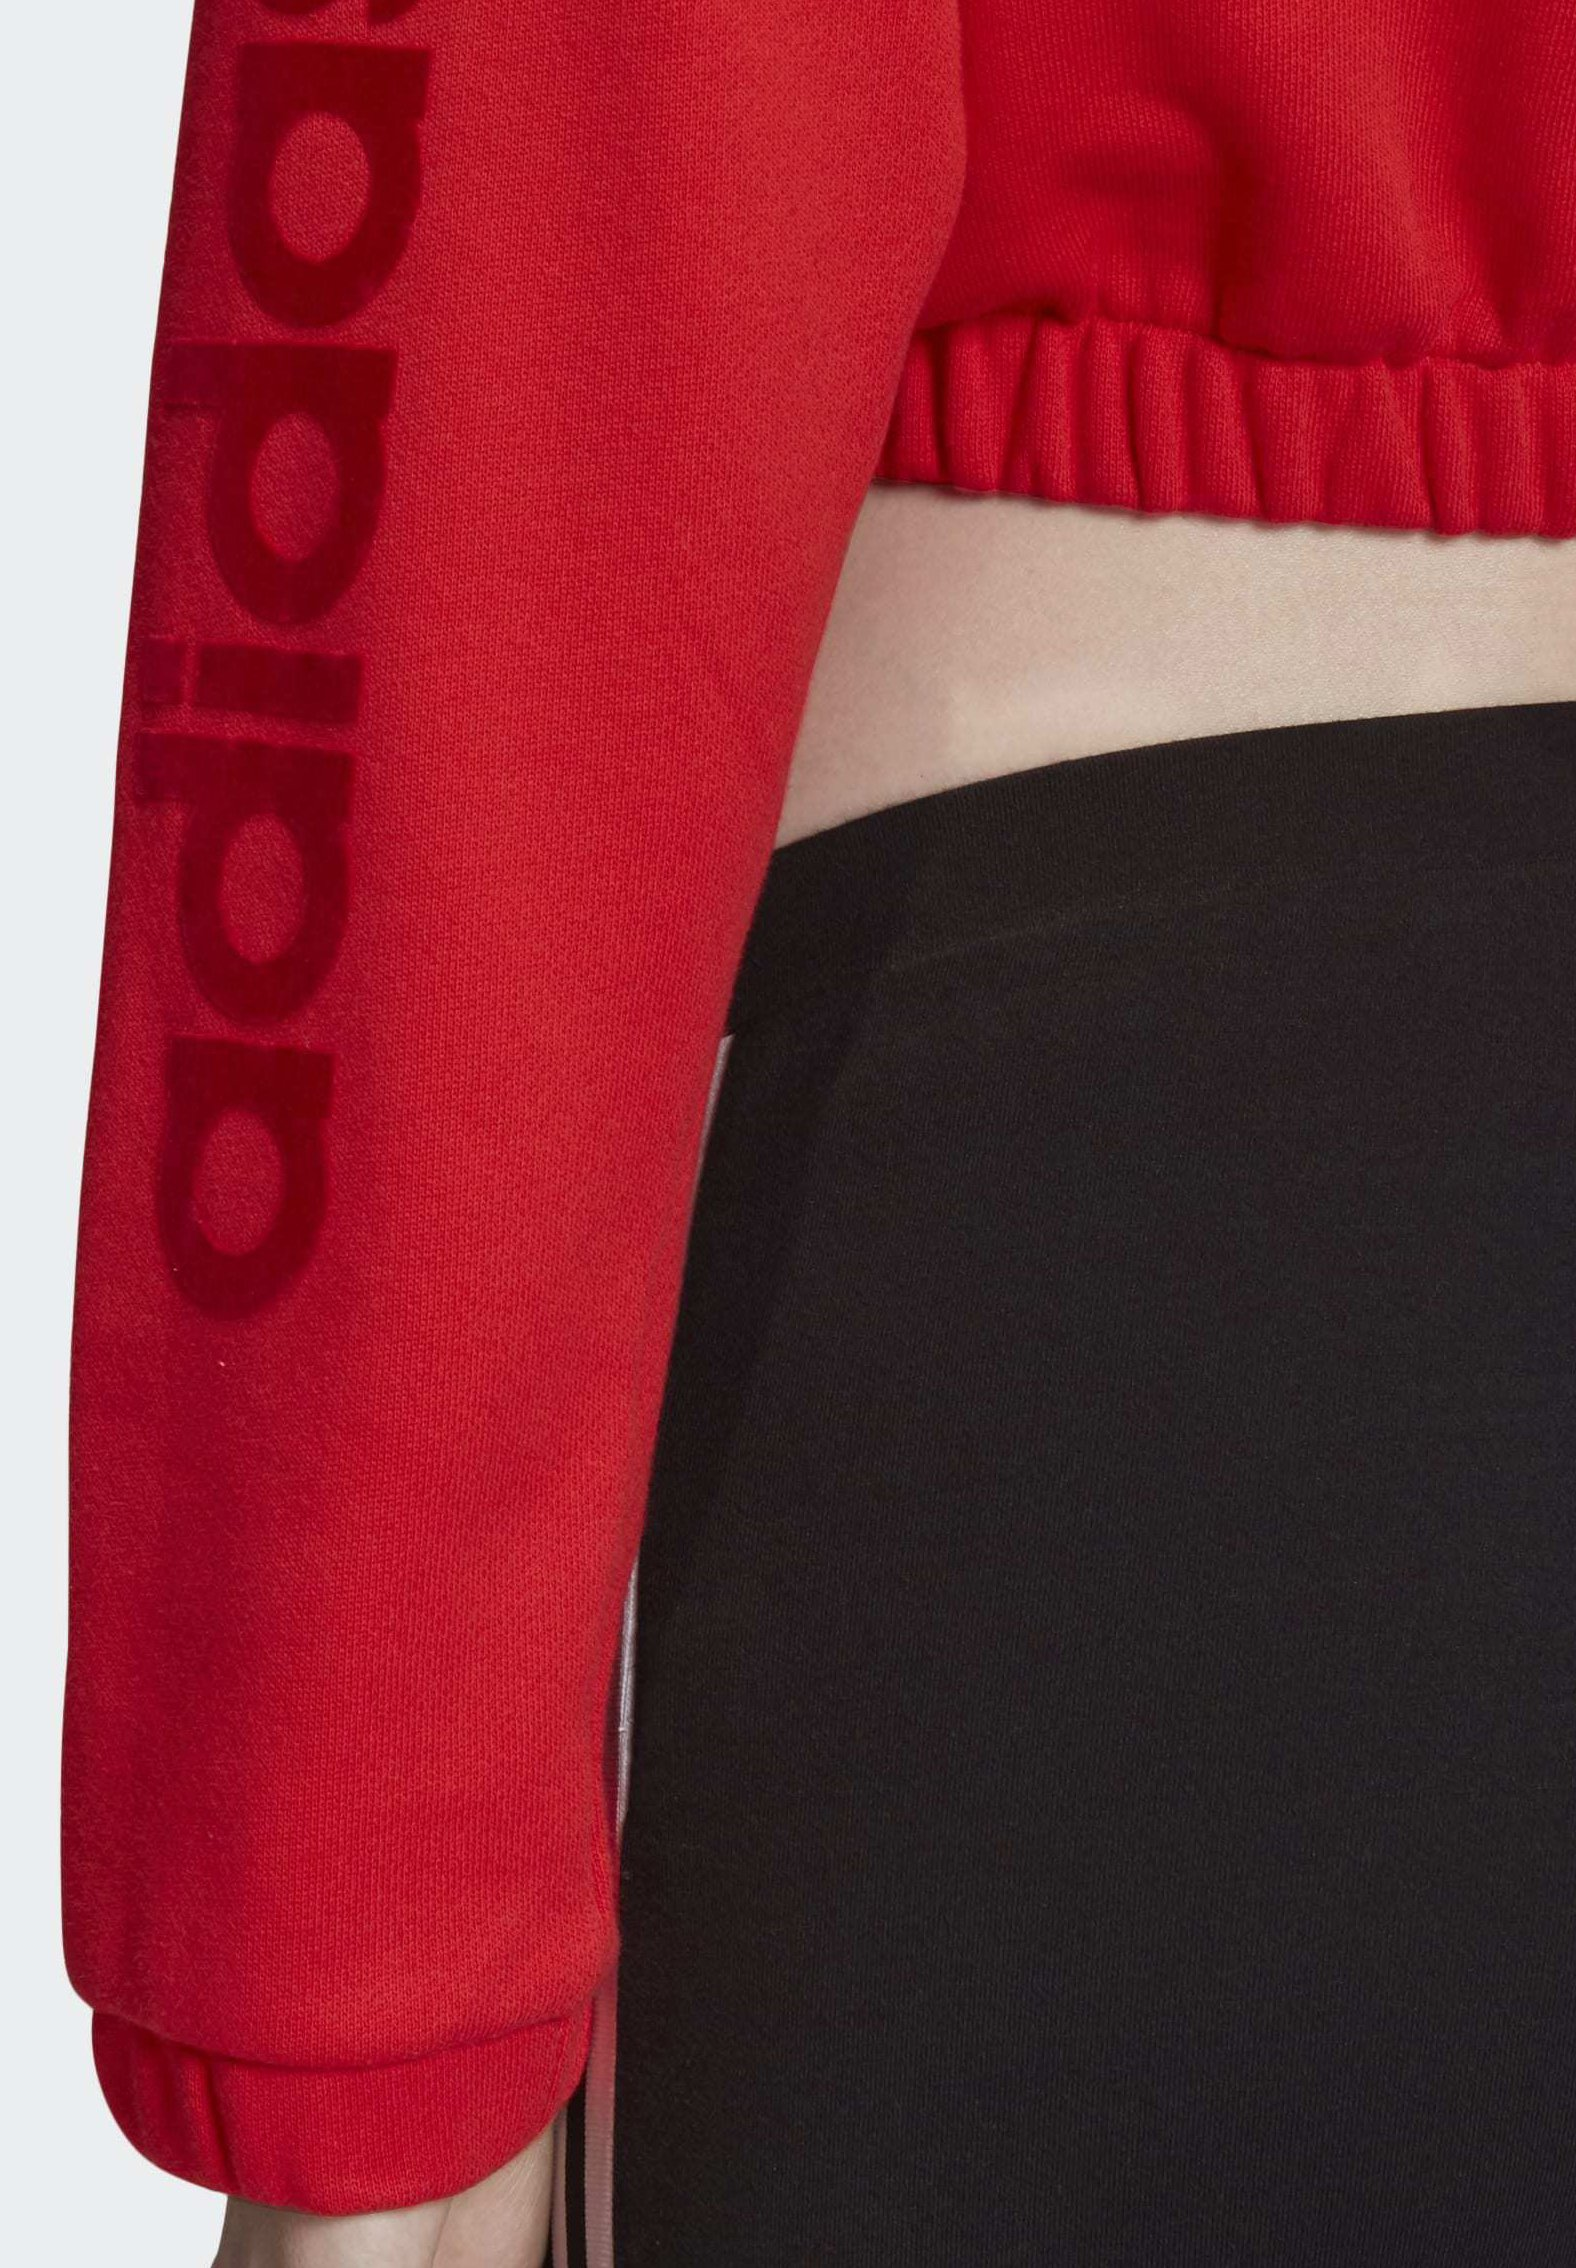 adidas Originals CROPPED HOODIE - Sweat à capuche - red - Pulls & Gilets Femme xzYr9